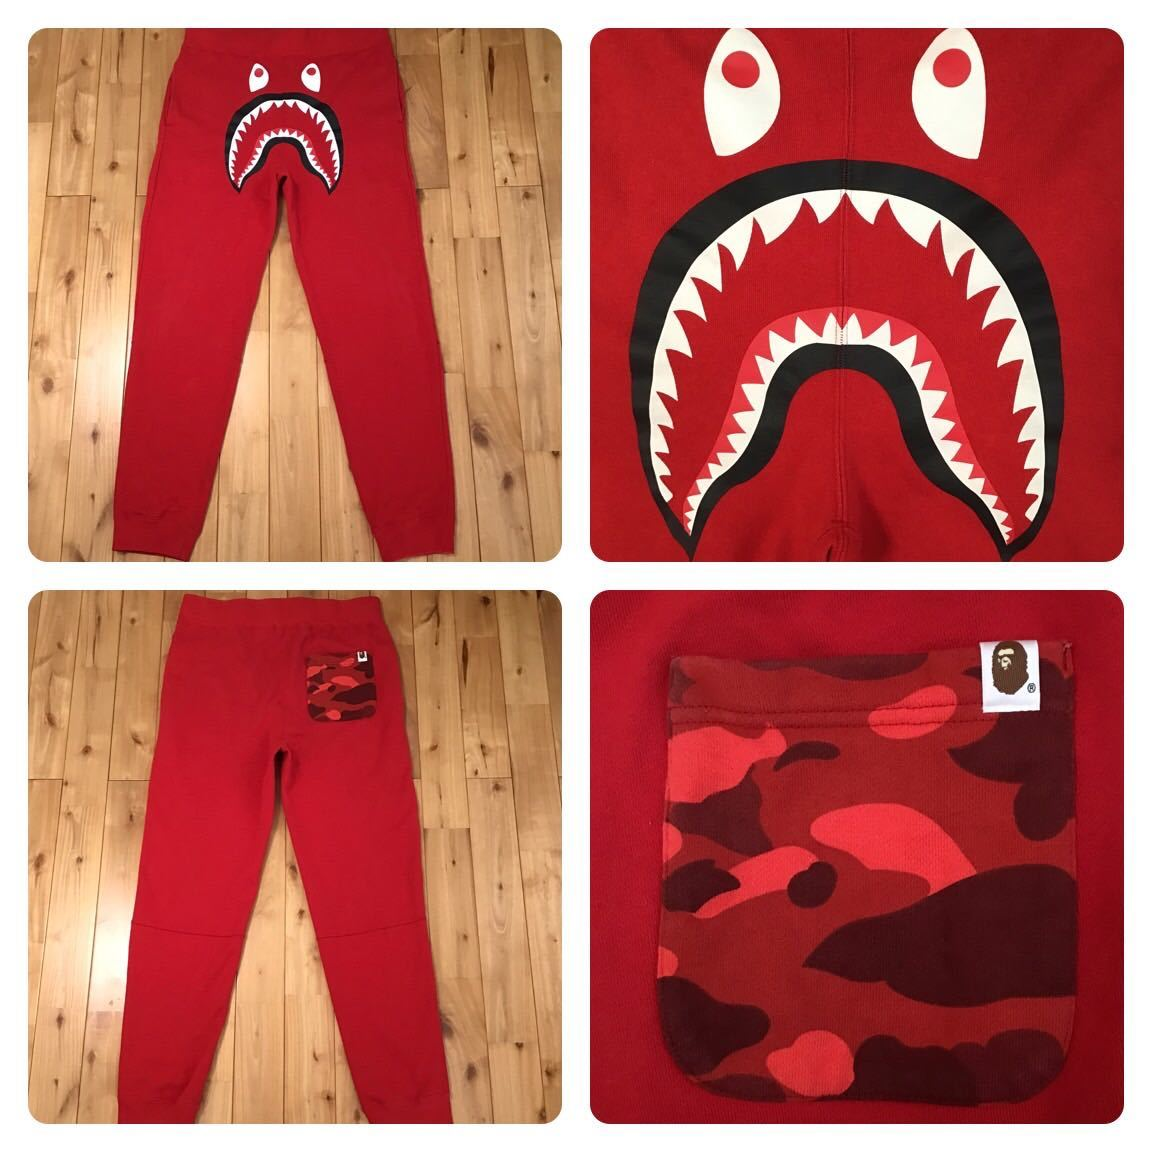 ★XL★ シャーク スウェットパンツ red camo × red shark pants a bathing ape BAPE シャーク エイプ ベイプ アベイシングエイプ 迷彩 132